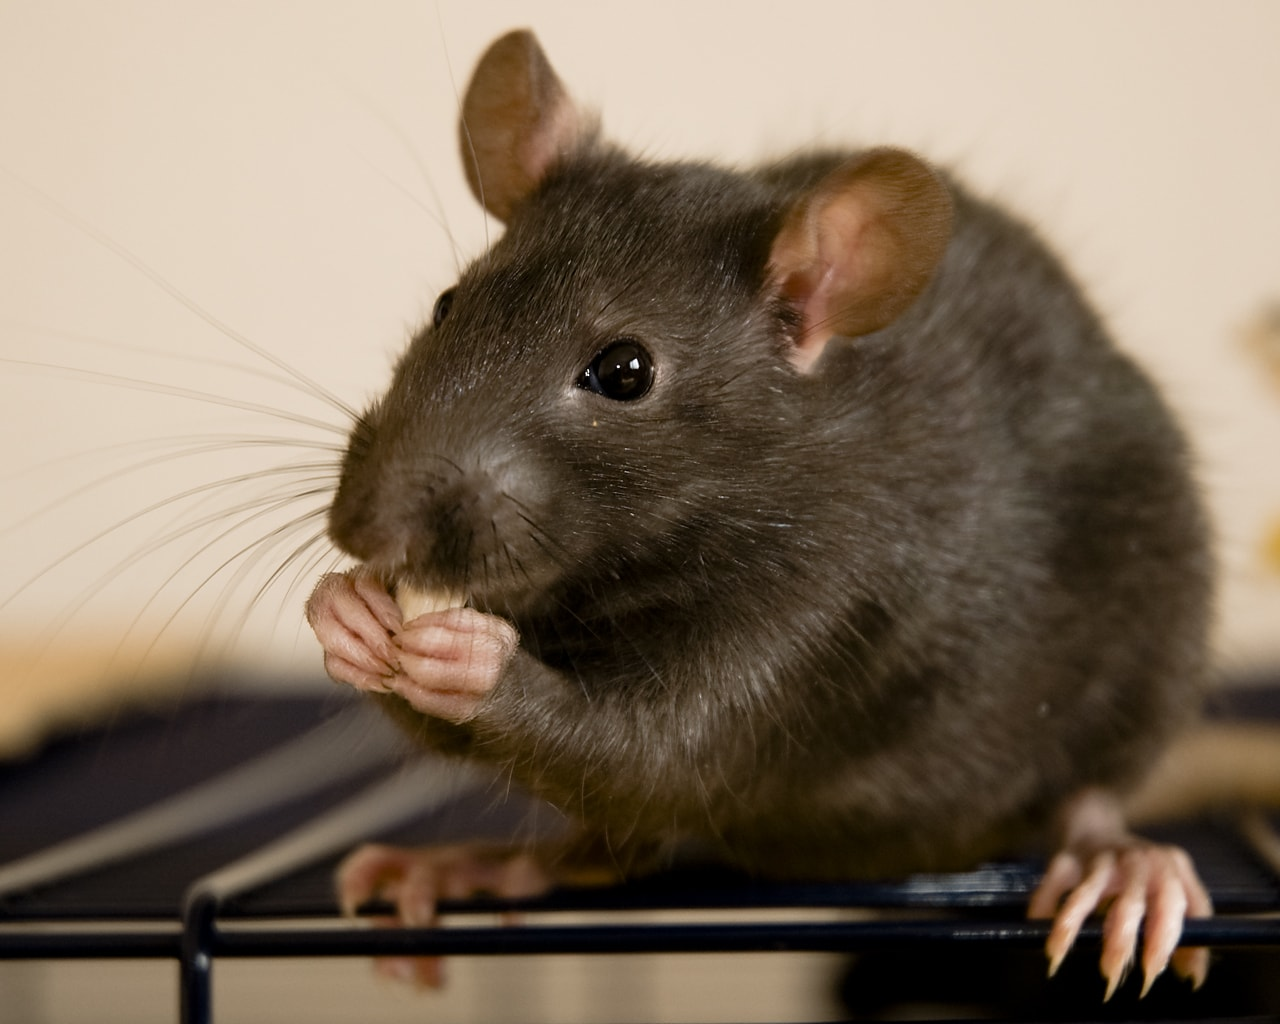 Rat Wallpapers hd